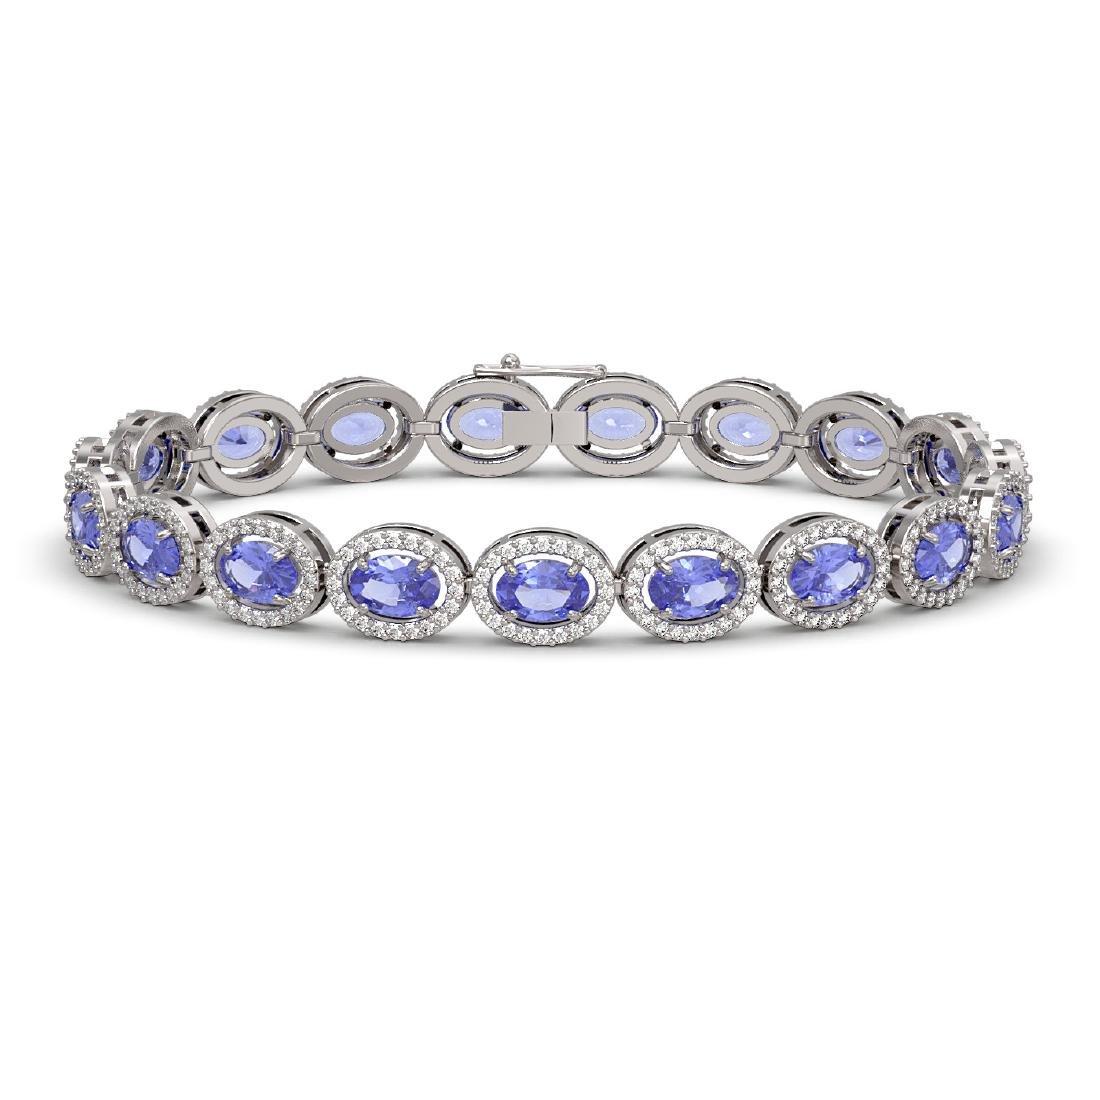 14.25 CTW Tanzanite & Diamond Halo Bracelet 10K White